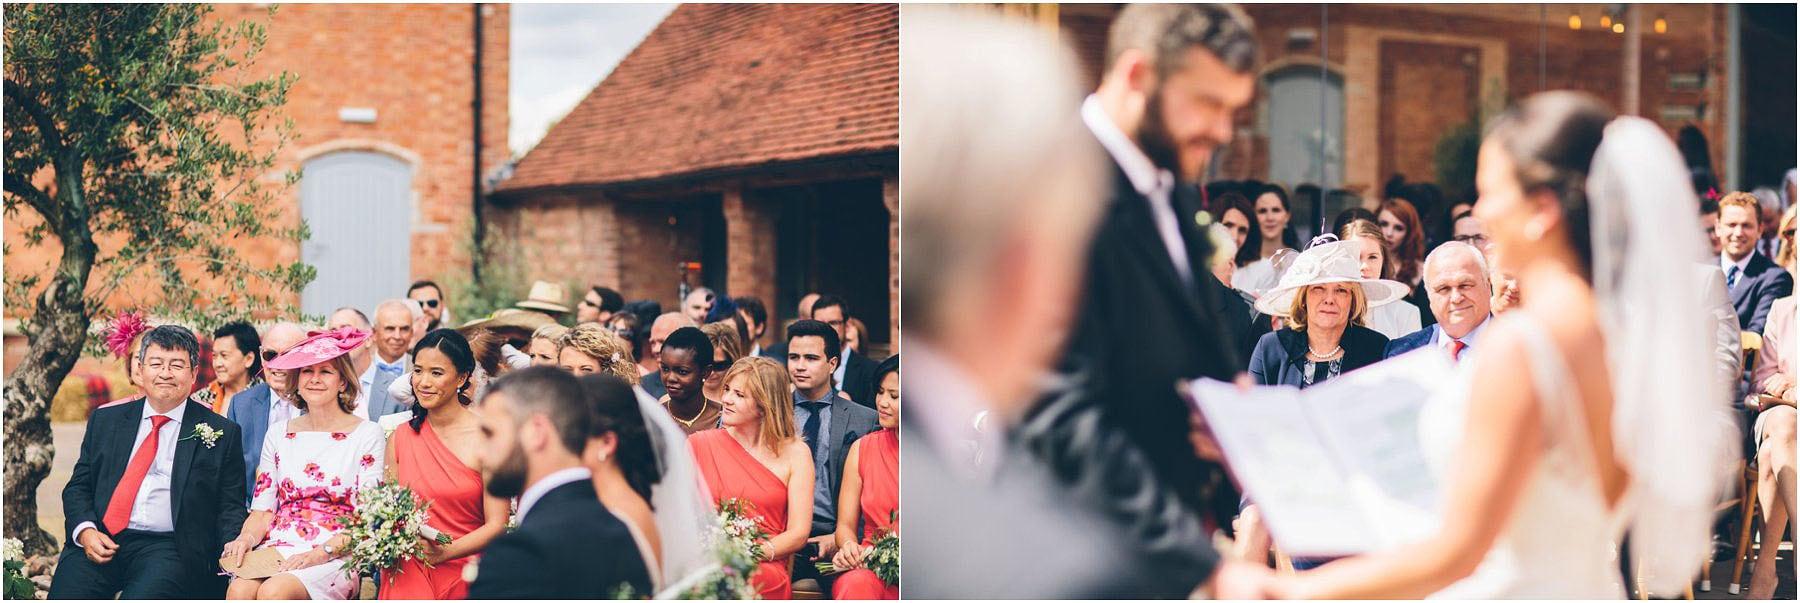 Swallows_Nest_Barn_Wedding_Photography_0085